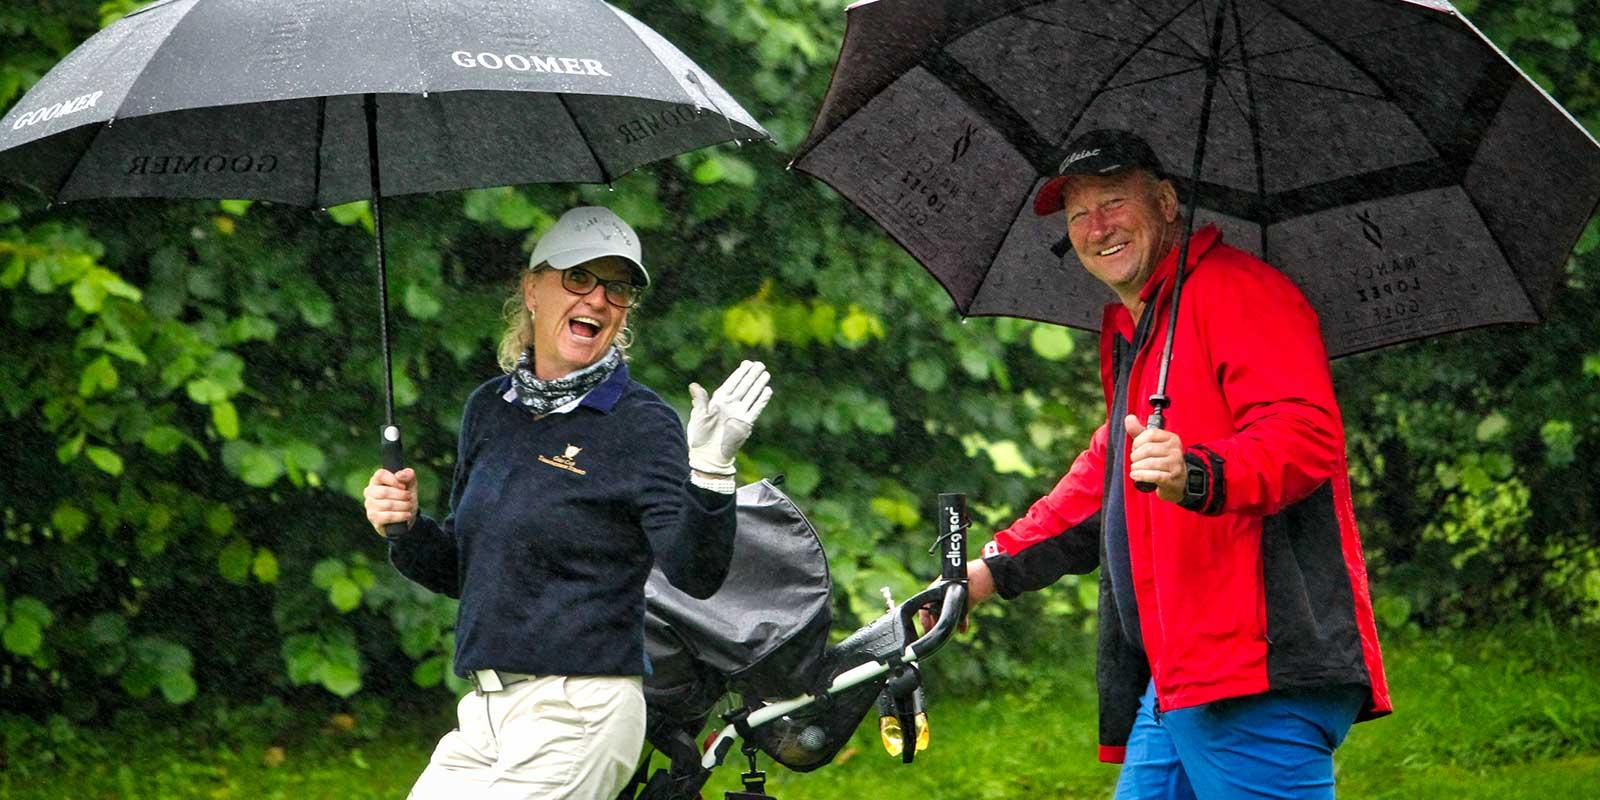 Grambek Open 2017 - Tag 3 Regen